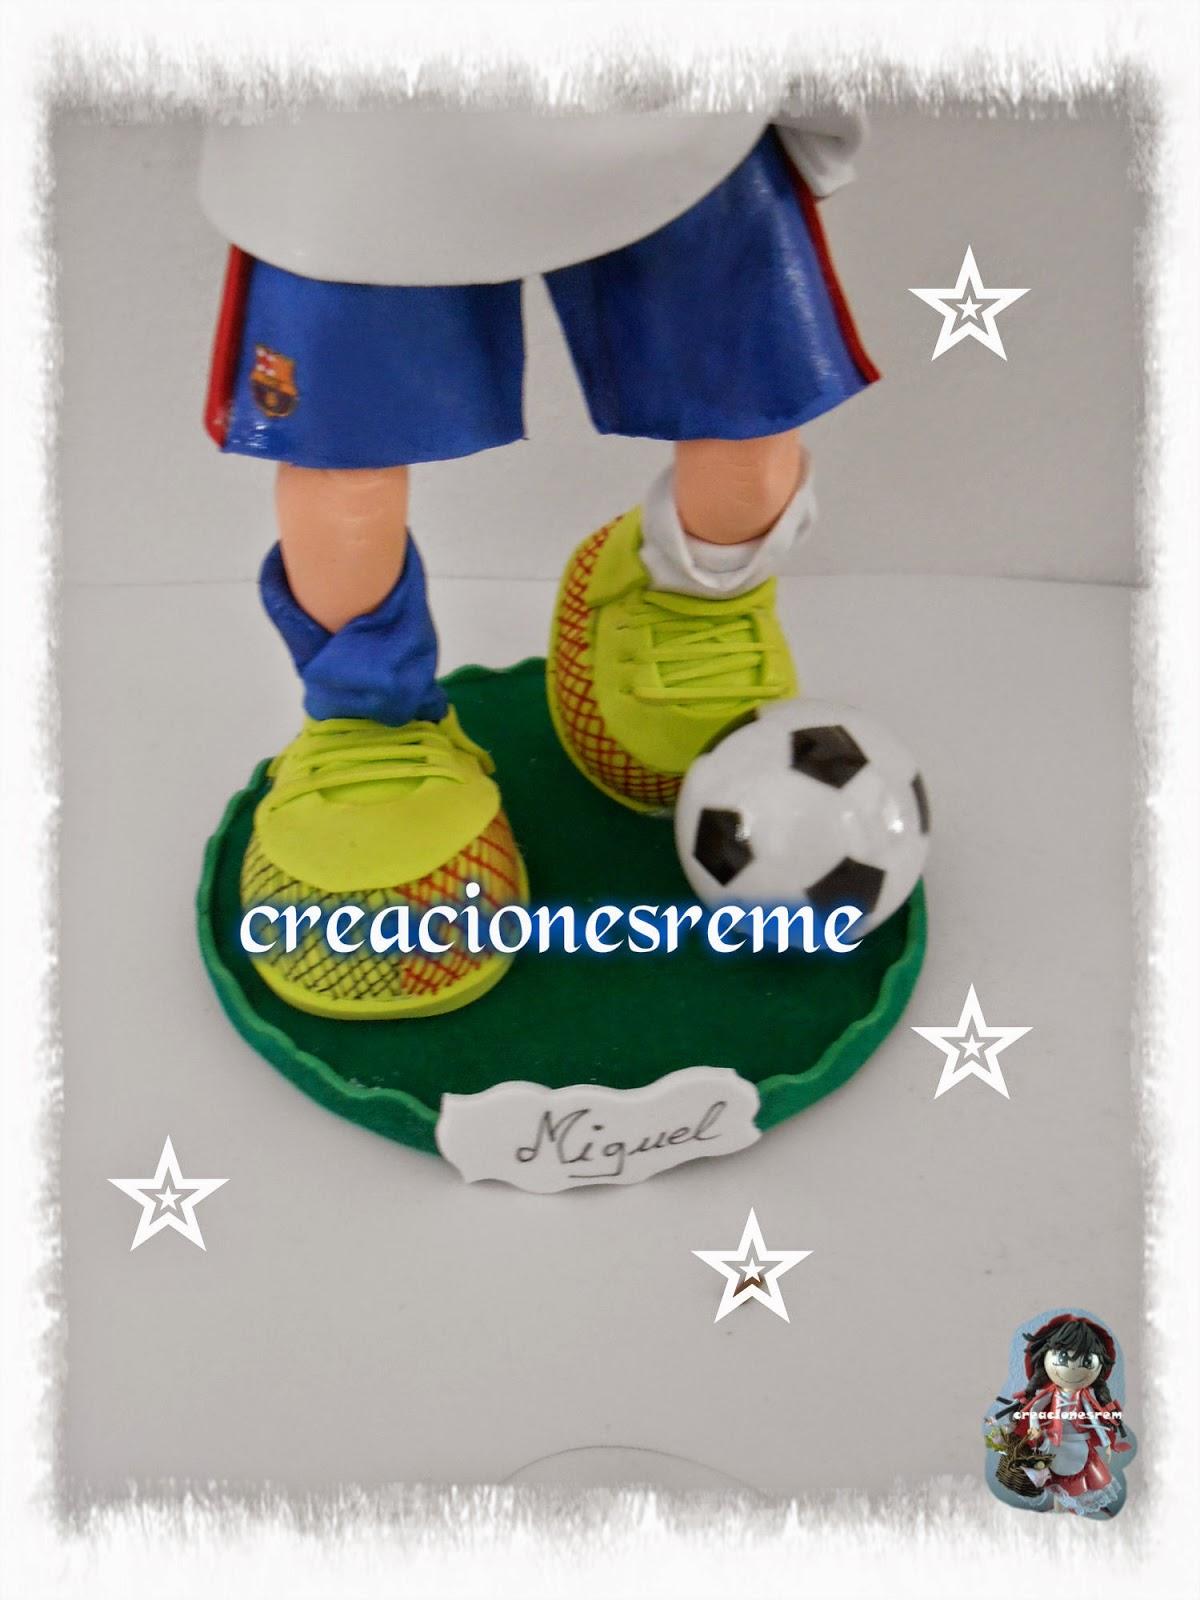 fofucha-creacionesreme-fofucha –extremeña-huevos-fritos-goma-eva-las-mejores-fofuchas-cocinera-goma-eva-mecanico-rueda-goma-eva-llave-inglesa-goma-eva-perrito-goma-eva-creacionesreme-fofucho futbolista-real-madrid-barsa